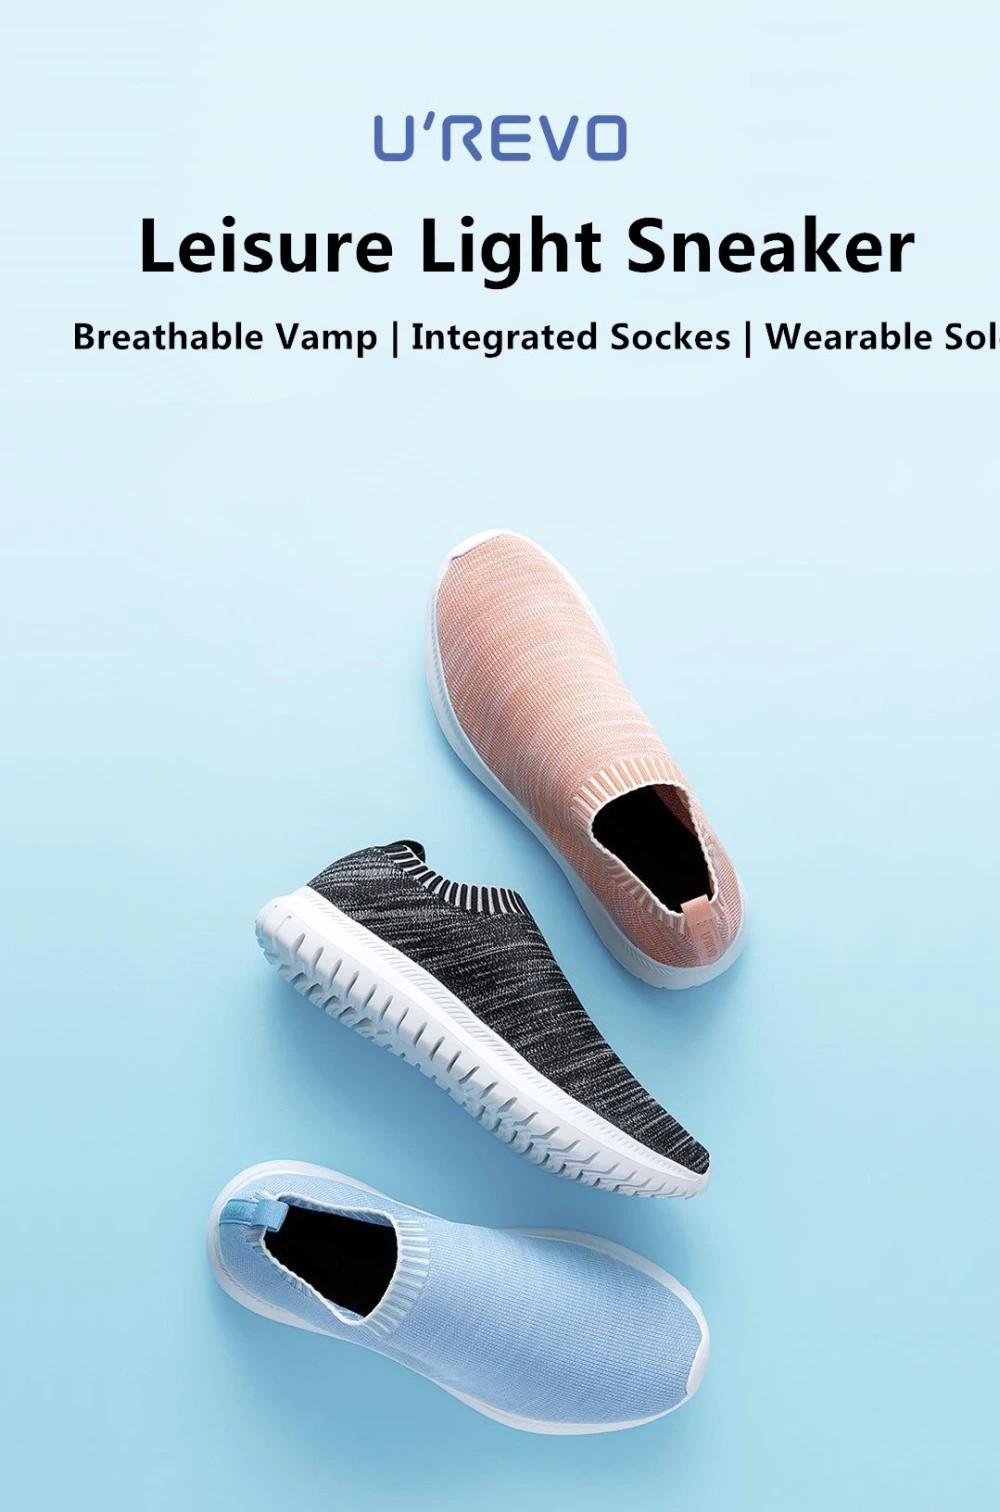 Xiaomi UREVO Leisure Light Sneaker Sport Gym Shoes Lightweight Ventilate Elastic Wearable Outdoor Sport Shoes for MenWomen (1)